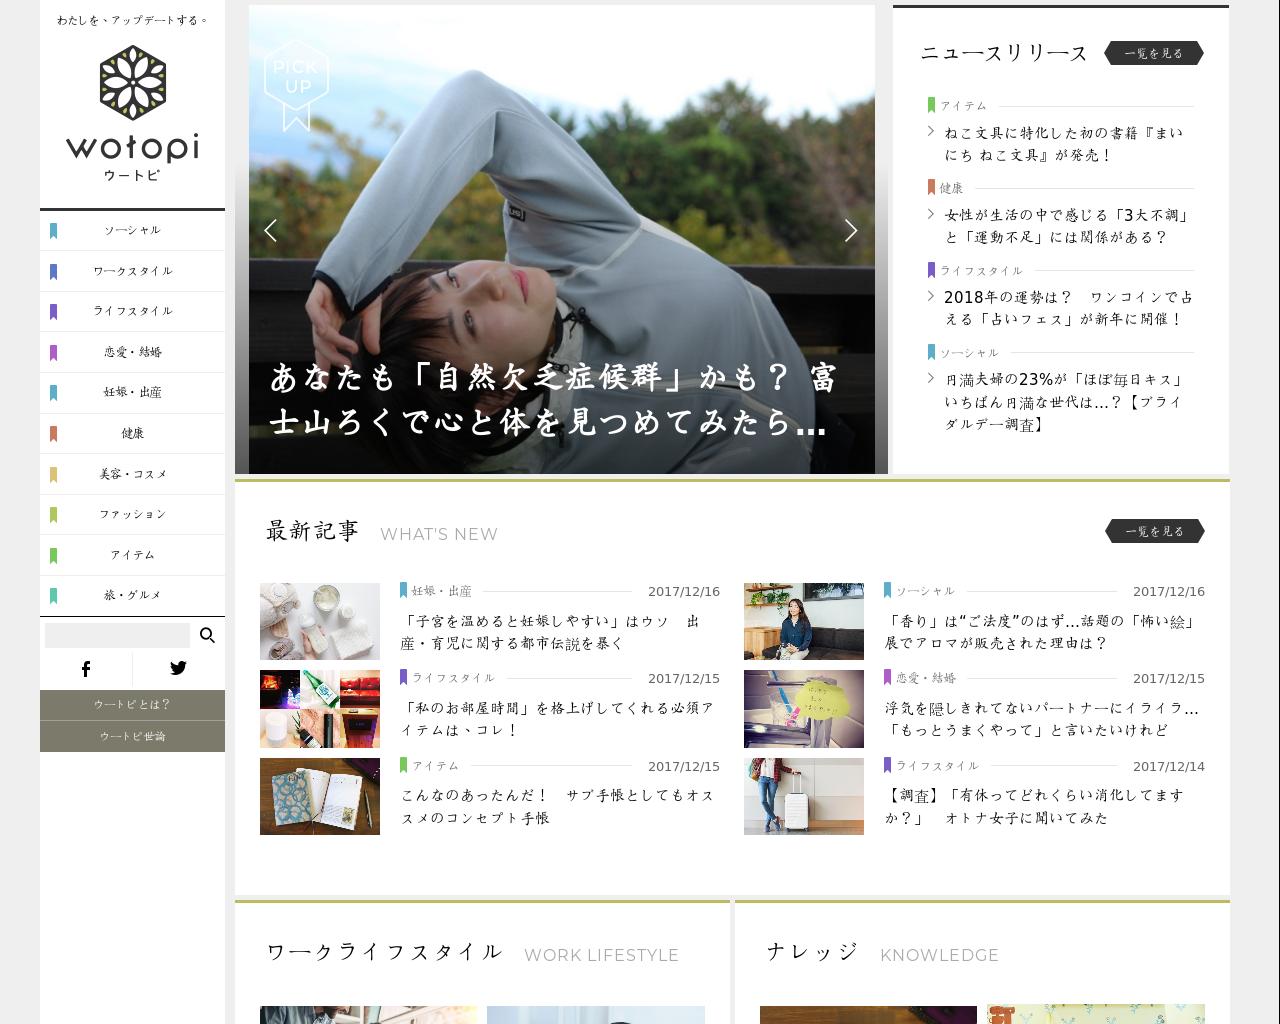 wotopi.jp(2017/12/16 20:20:47)